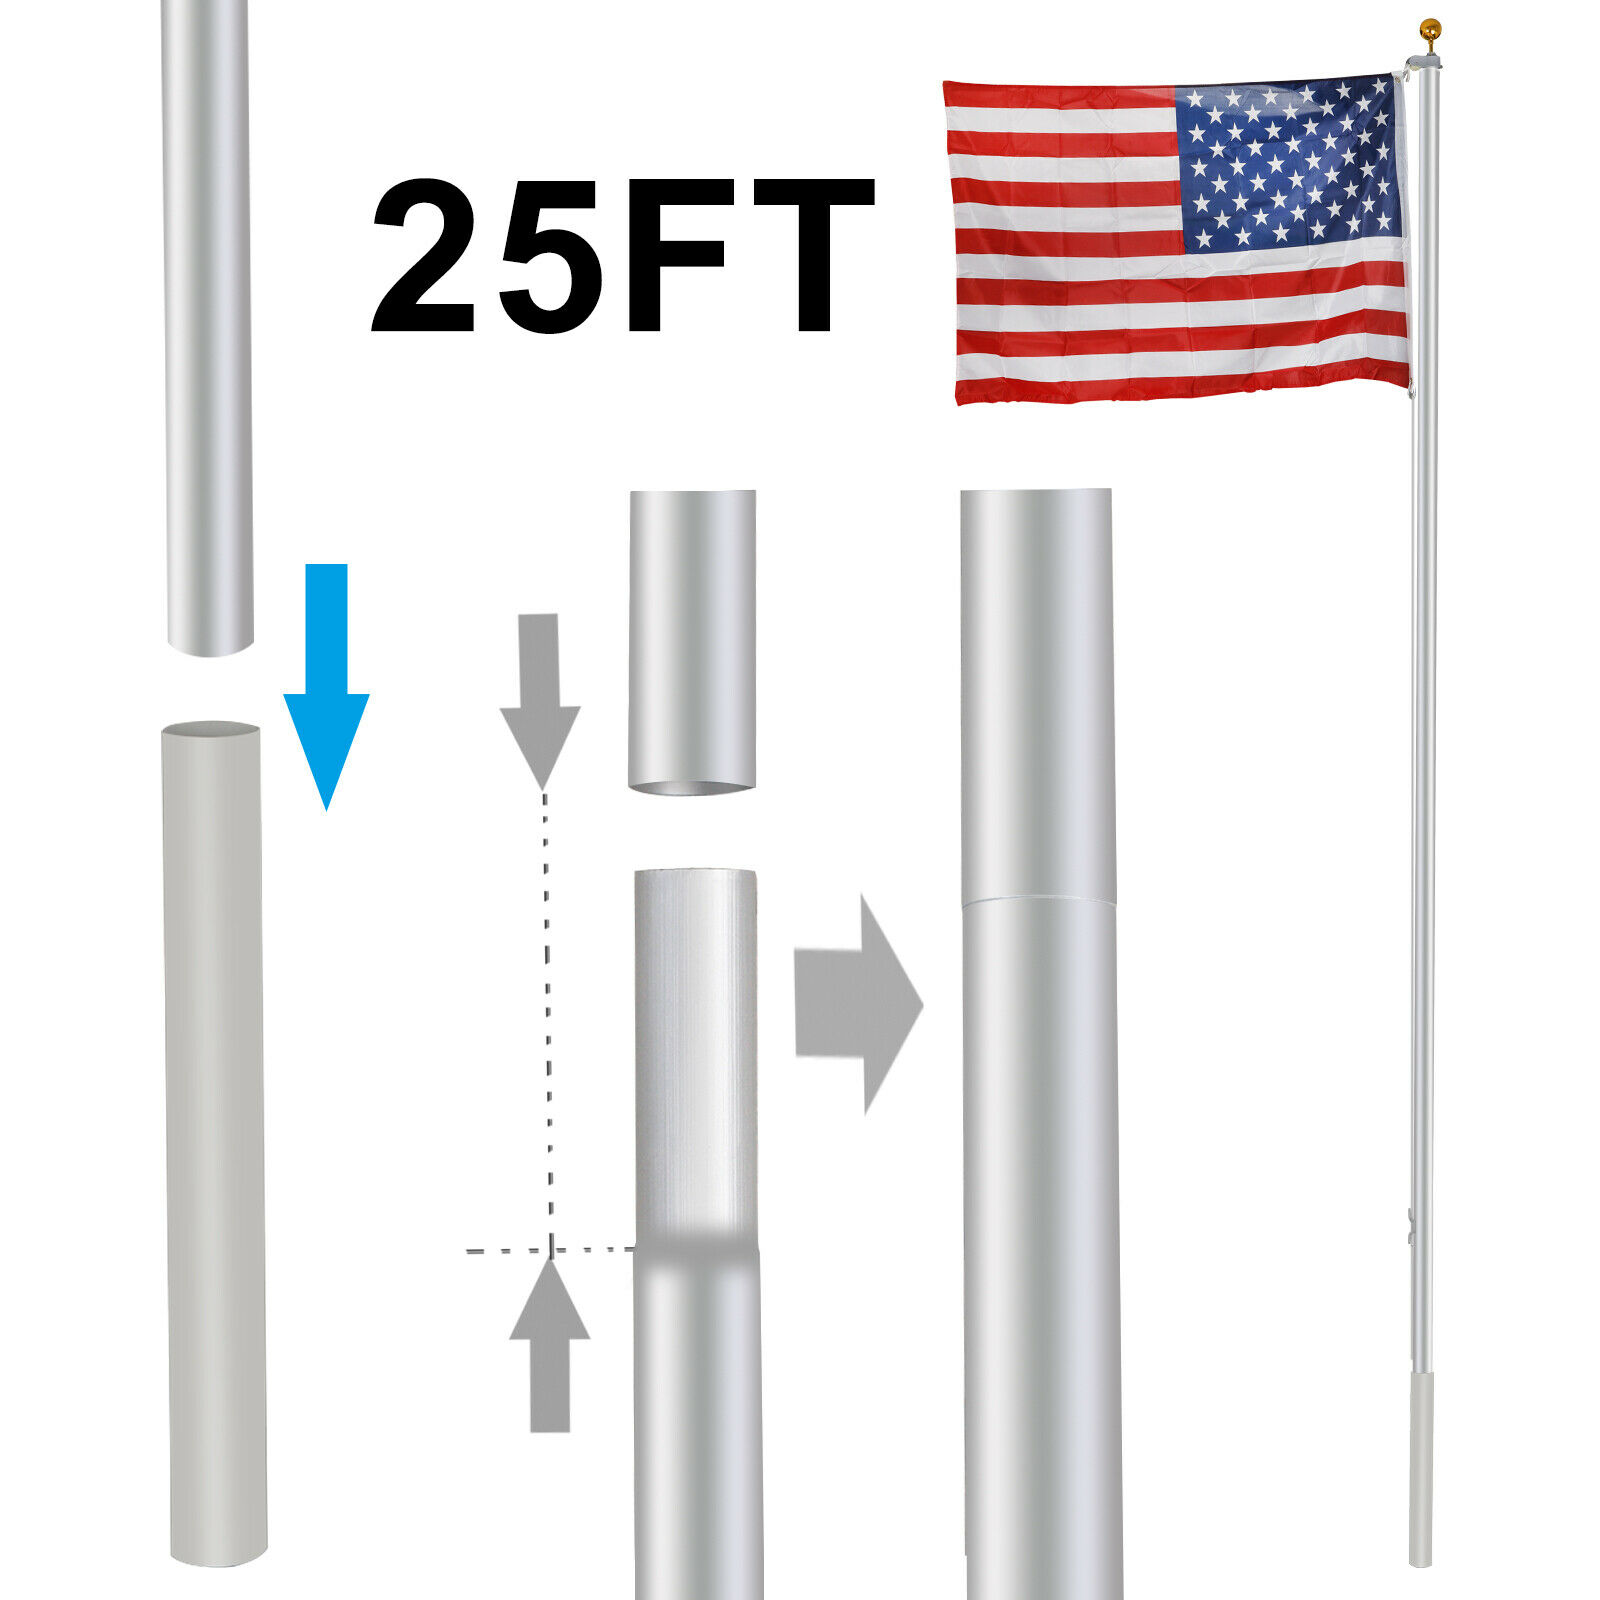 25FT Flag Pole Heavy Duty Sectional Kit Outdoor Halyard Pole